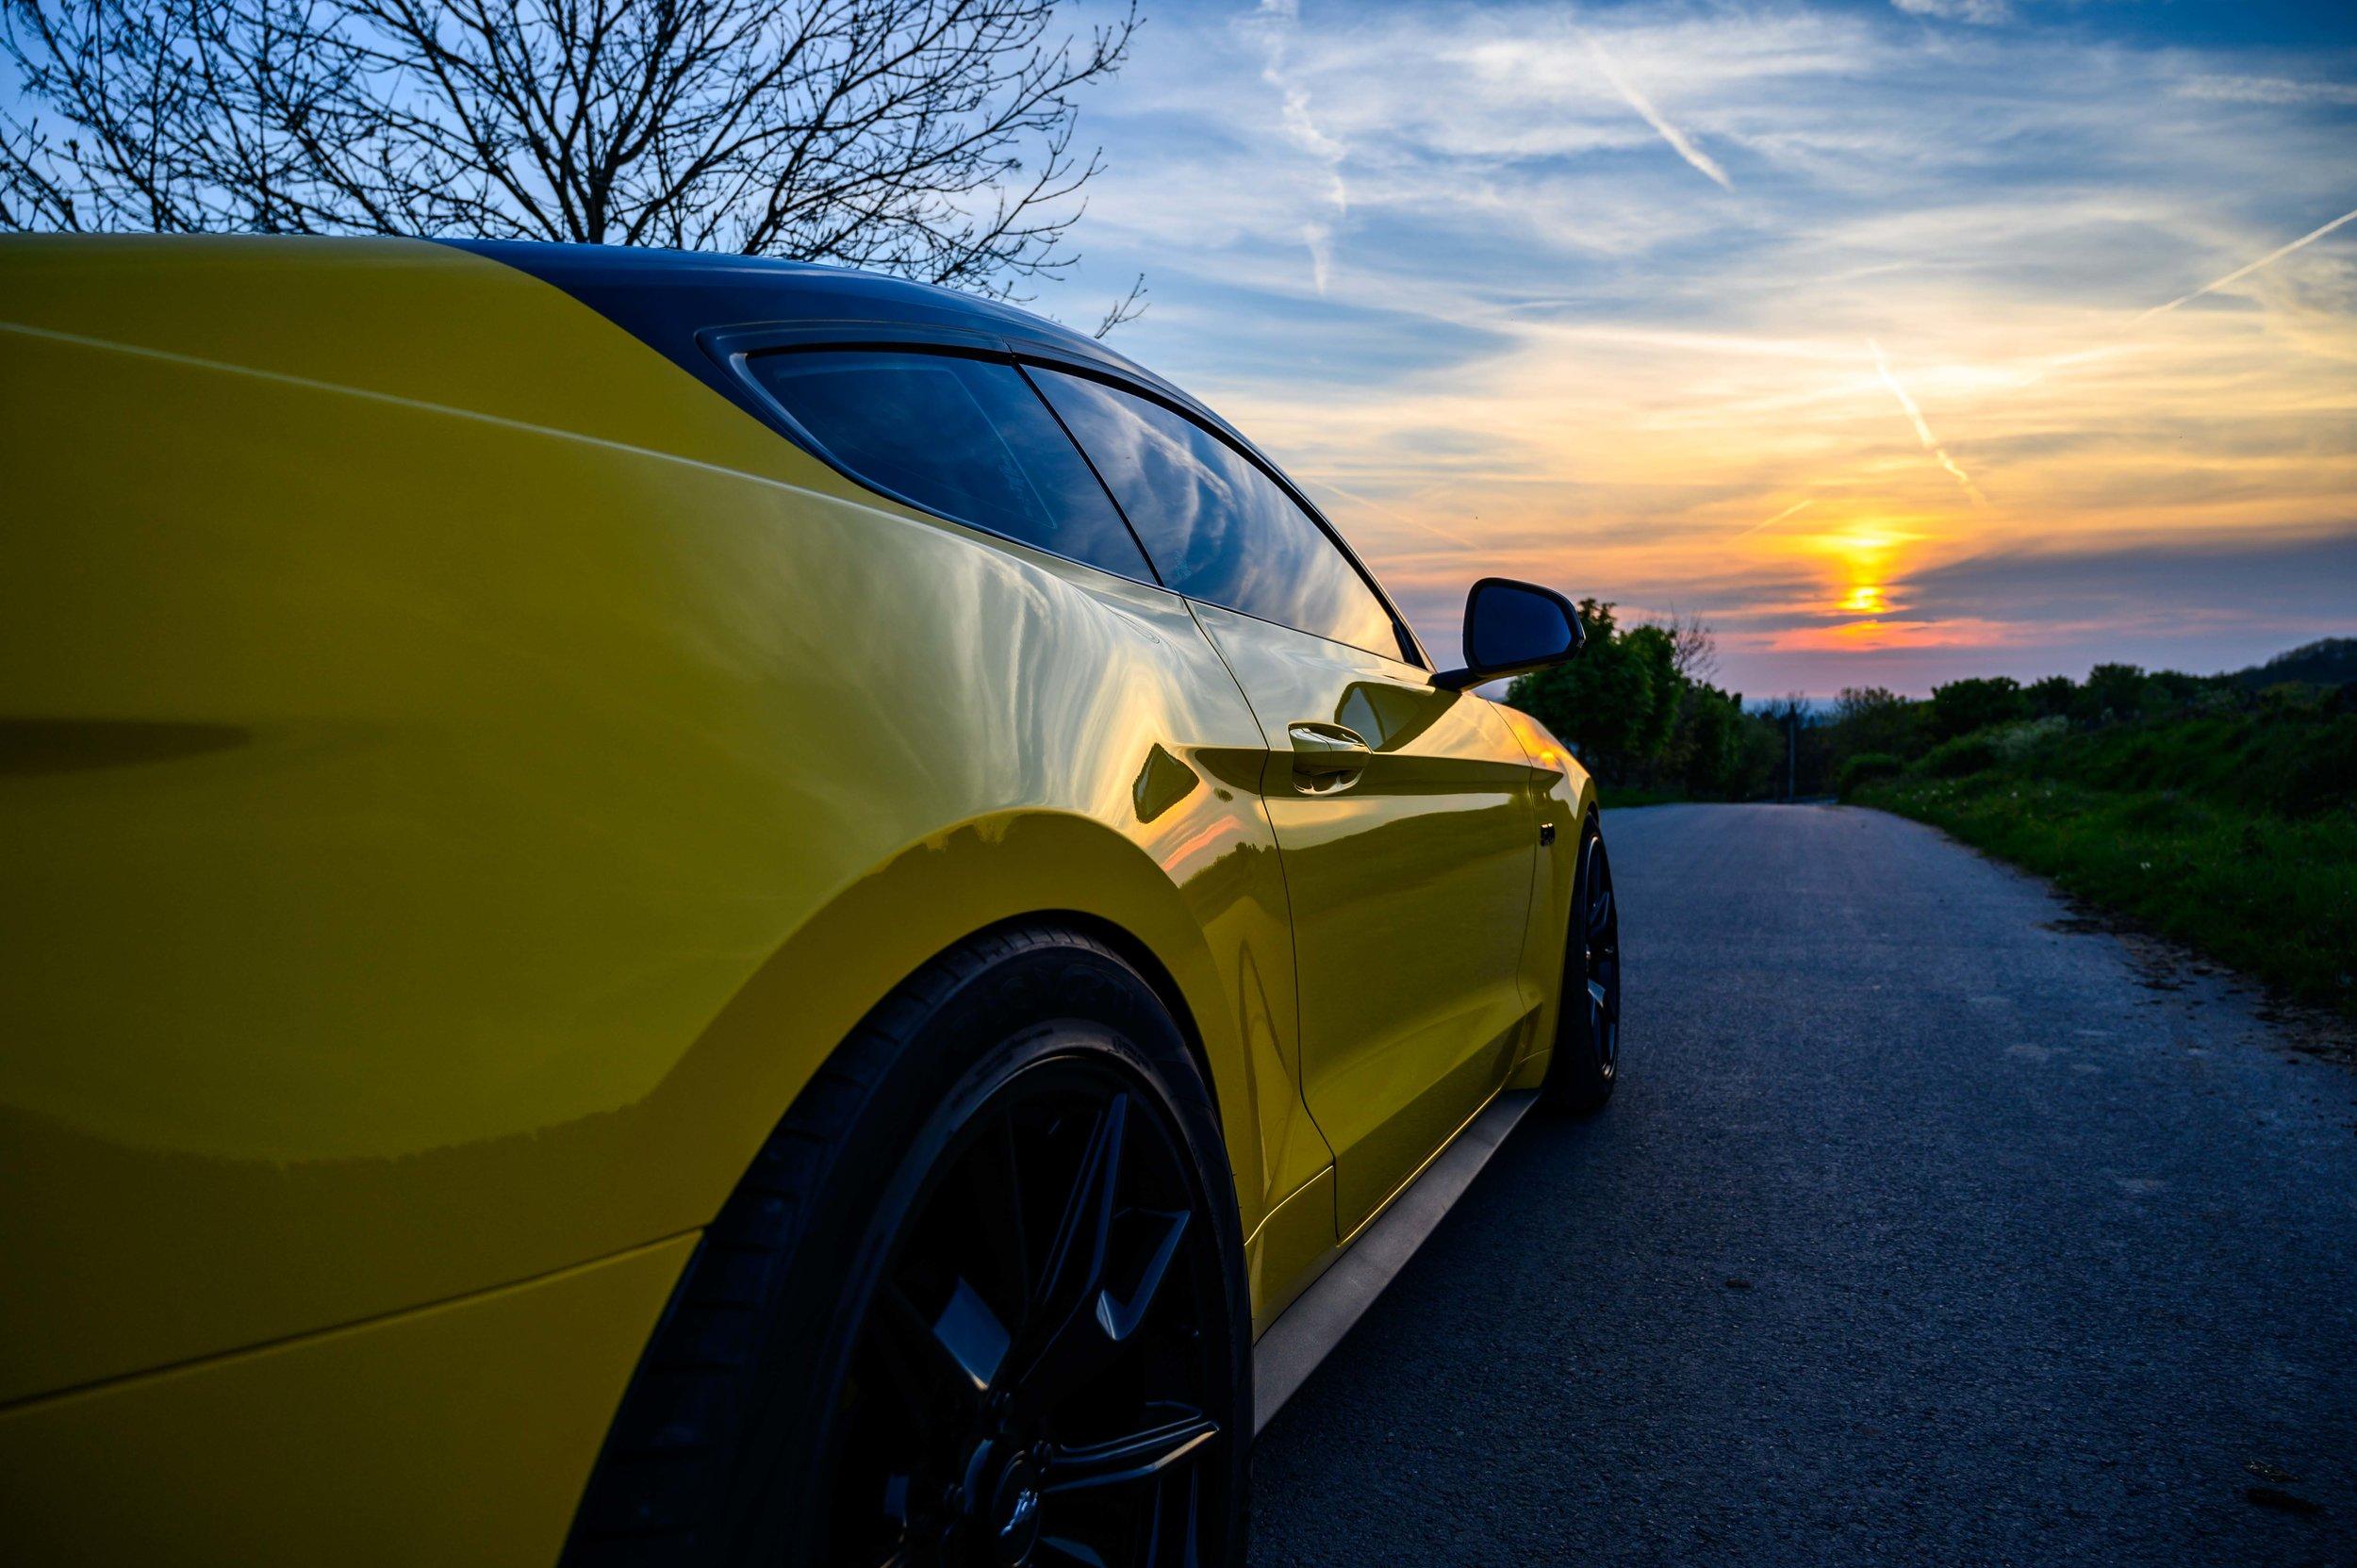 Mustang-27.jpg